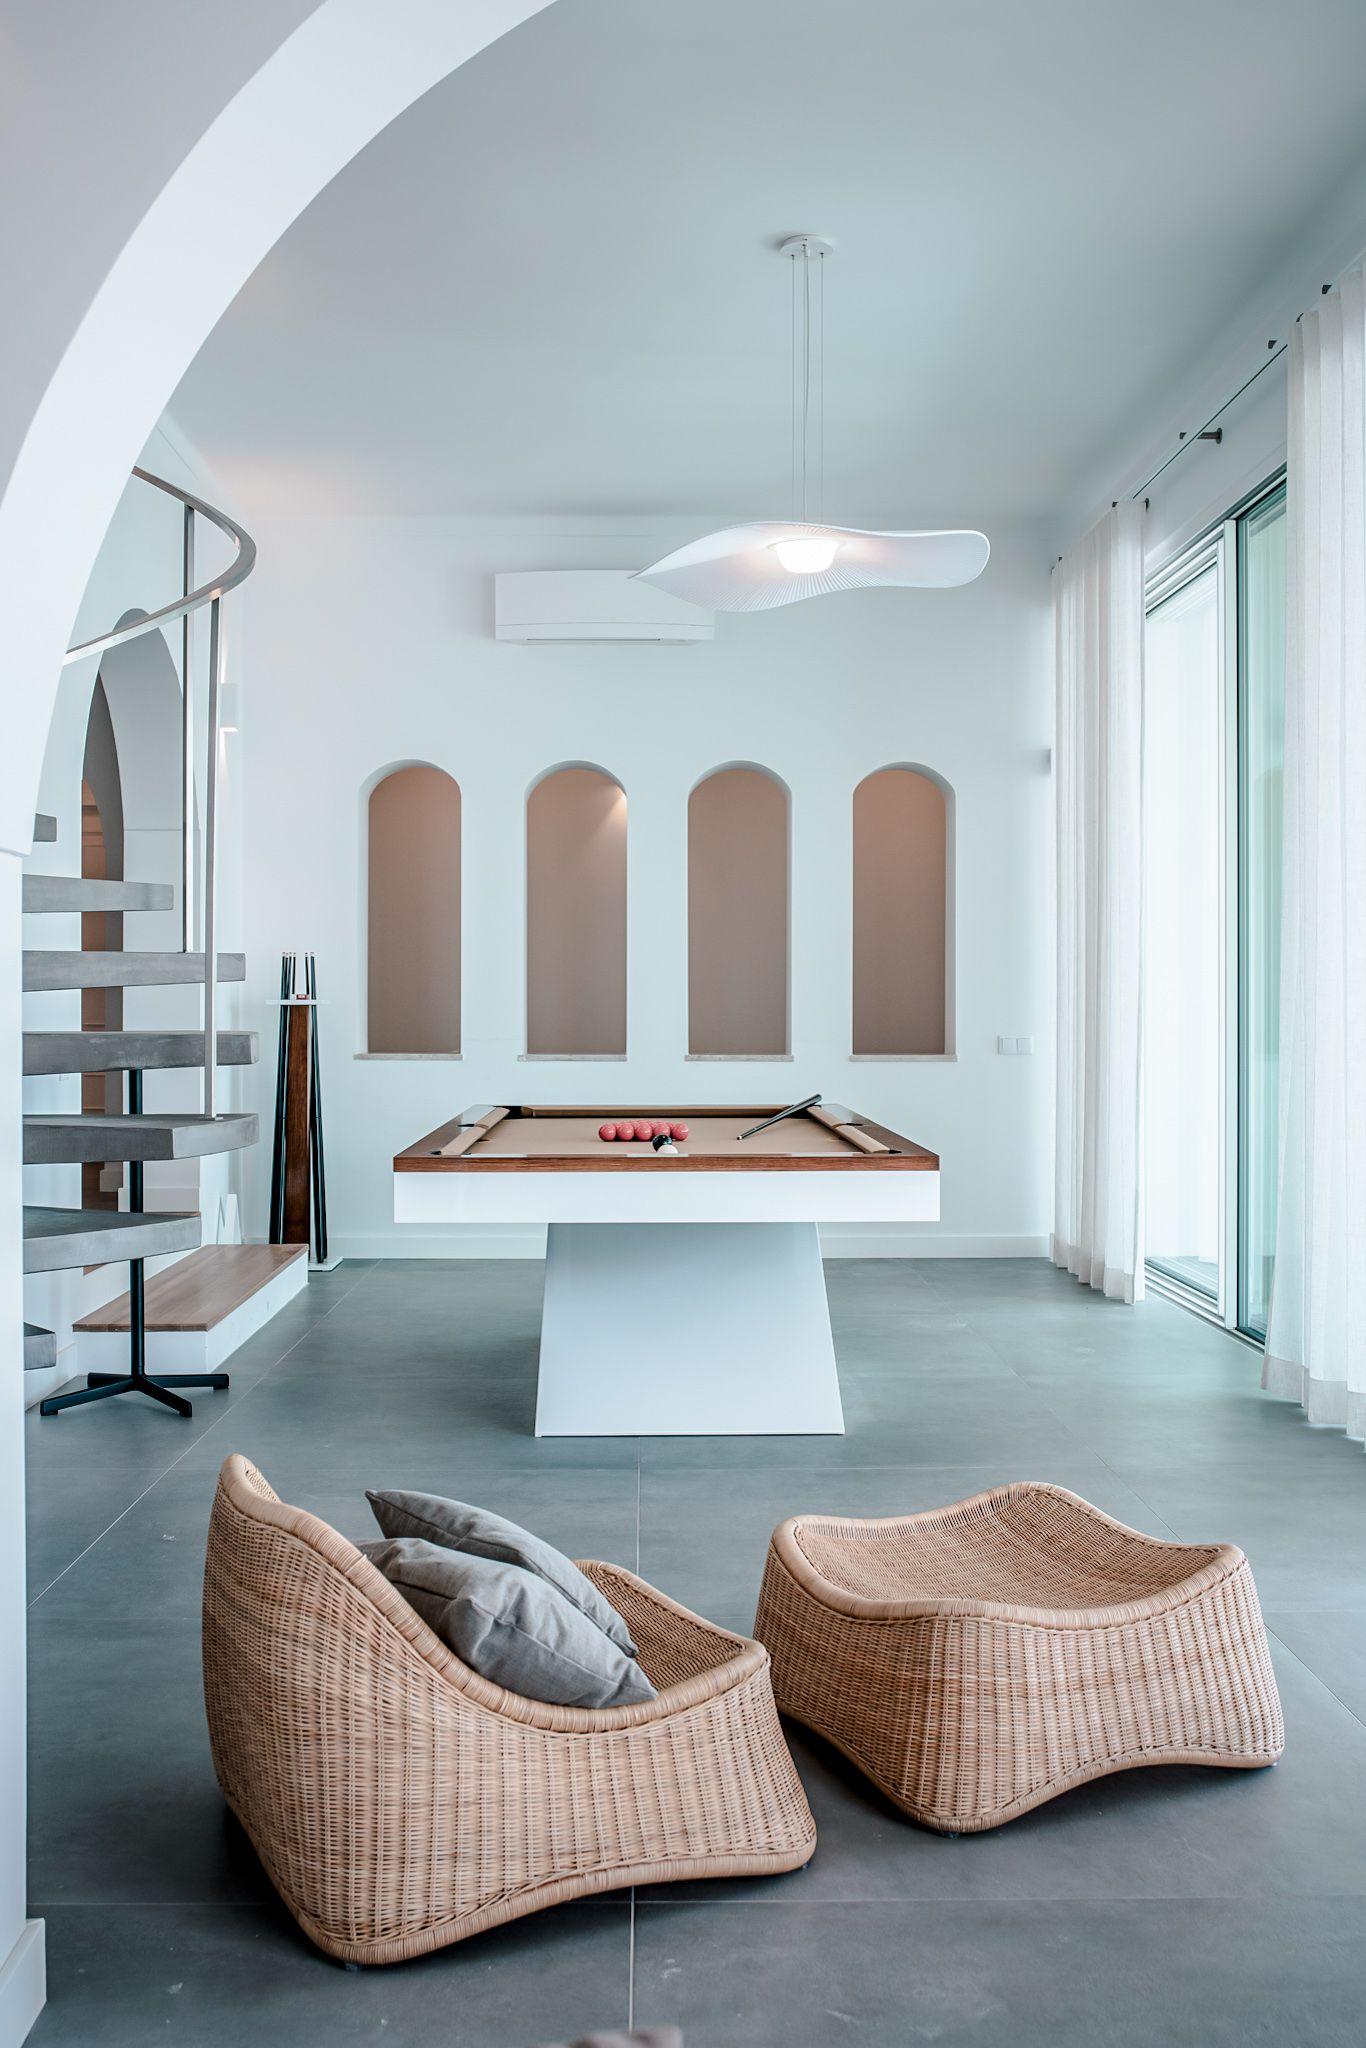 Living Room Inspiration I 2020 Vardagsrum Inspiration